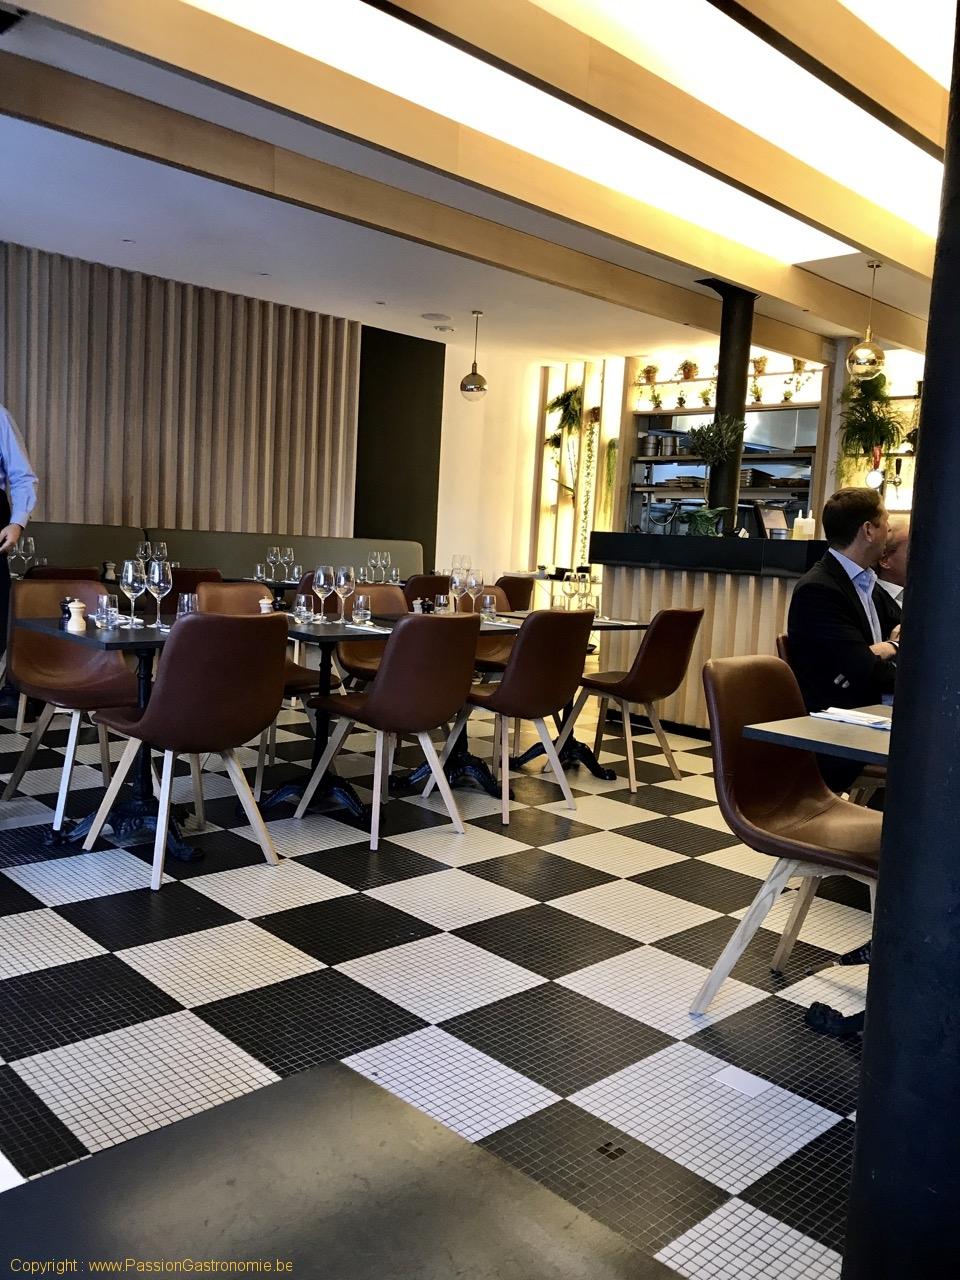 Restaurant Harvest - La salle